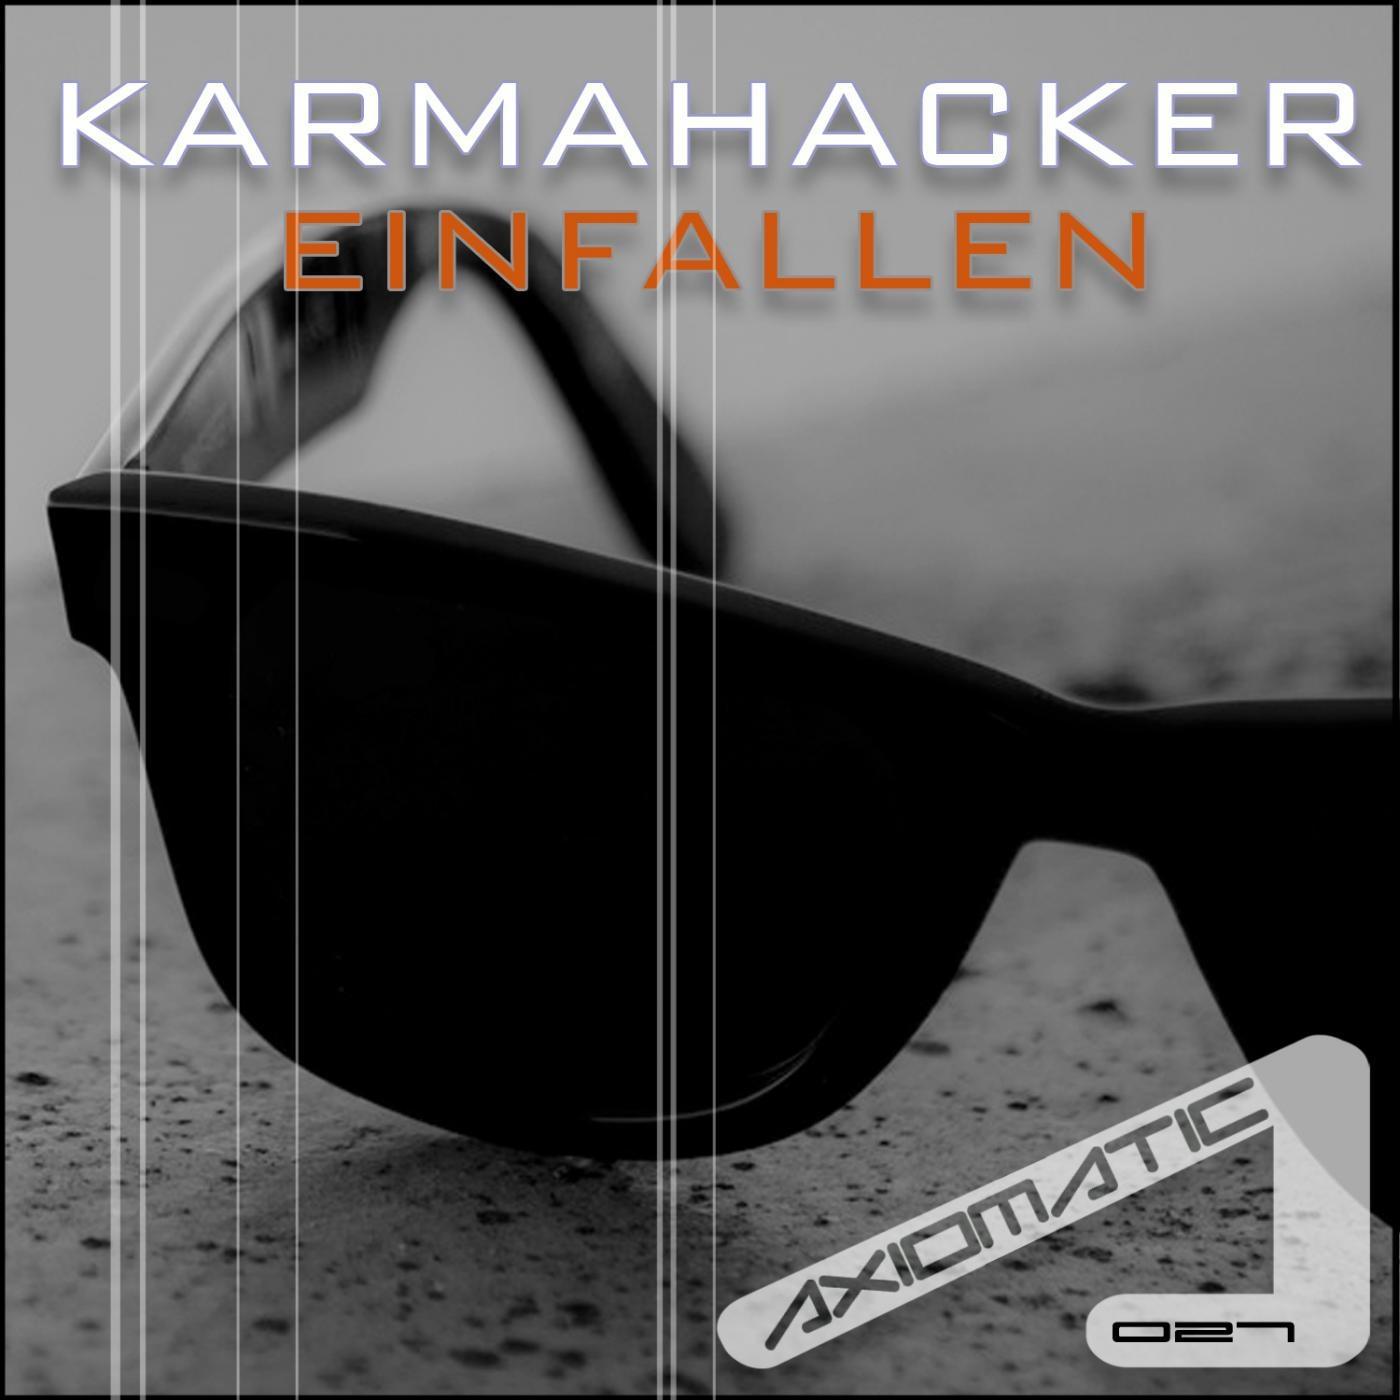 Karmahacker - Among Stars (Extended) (Original mix)